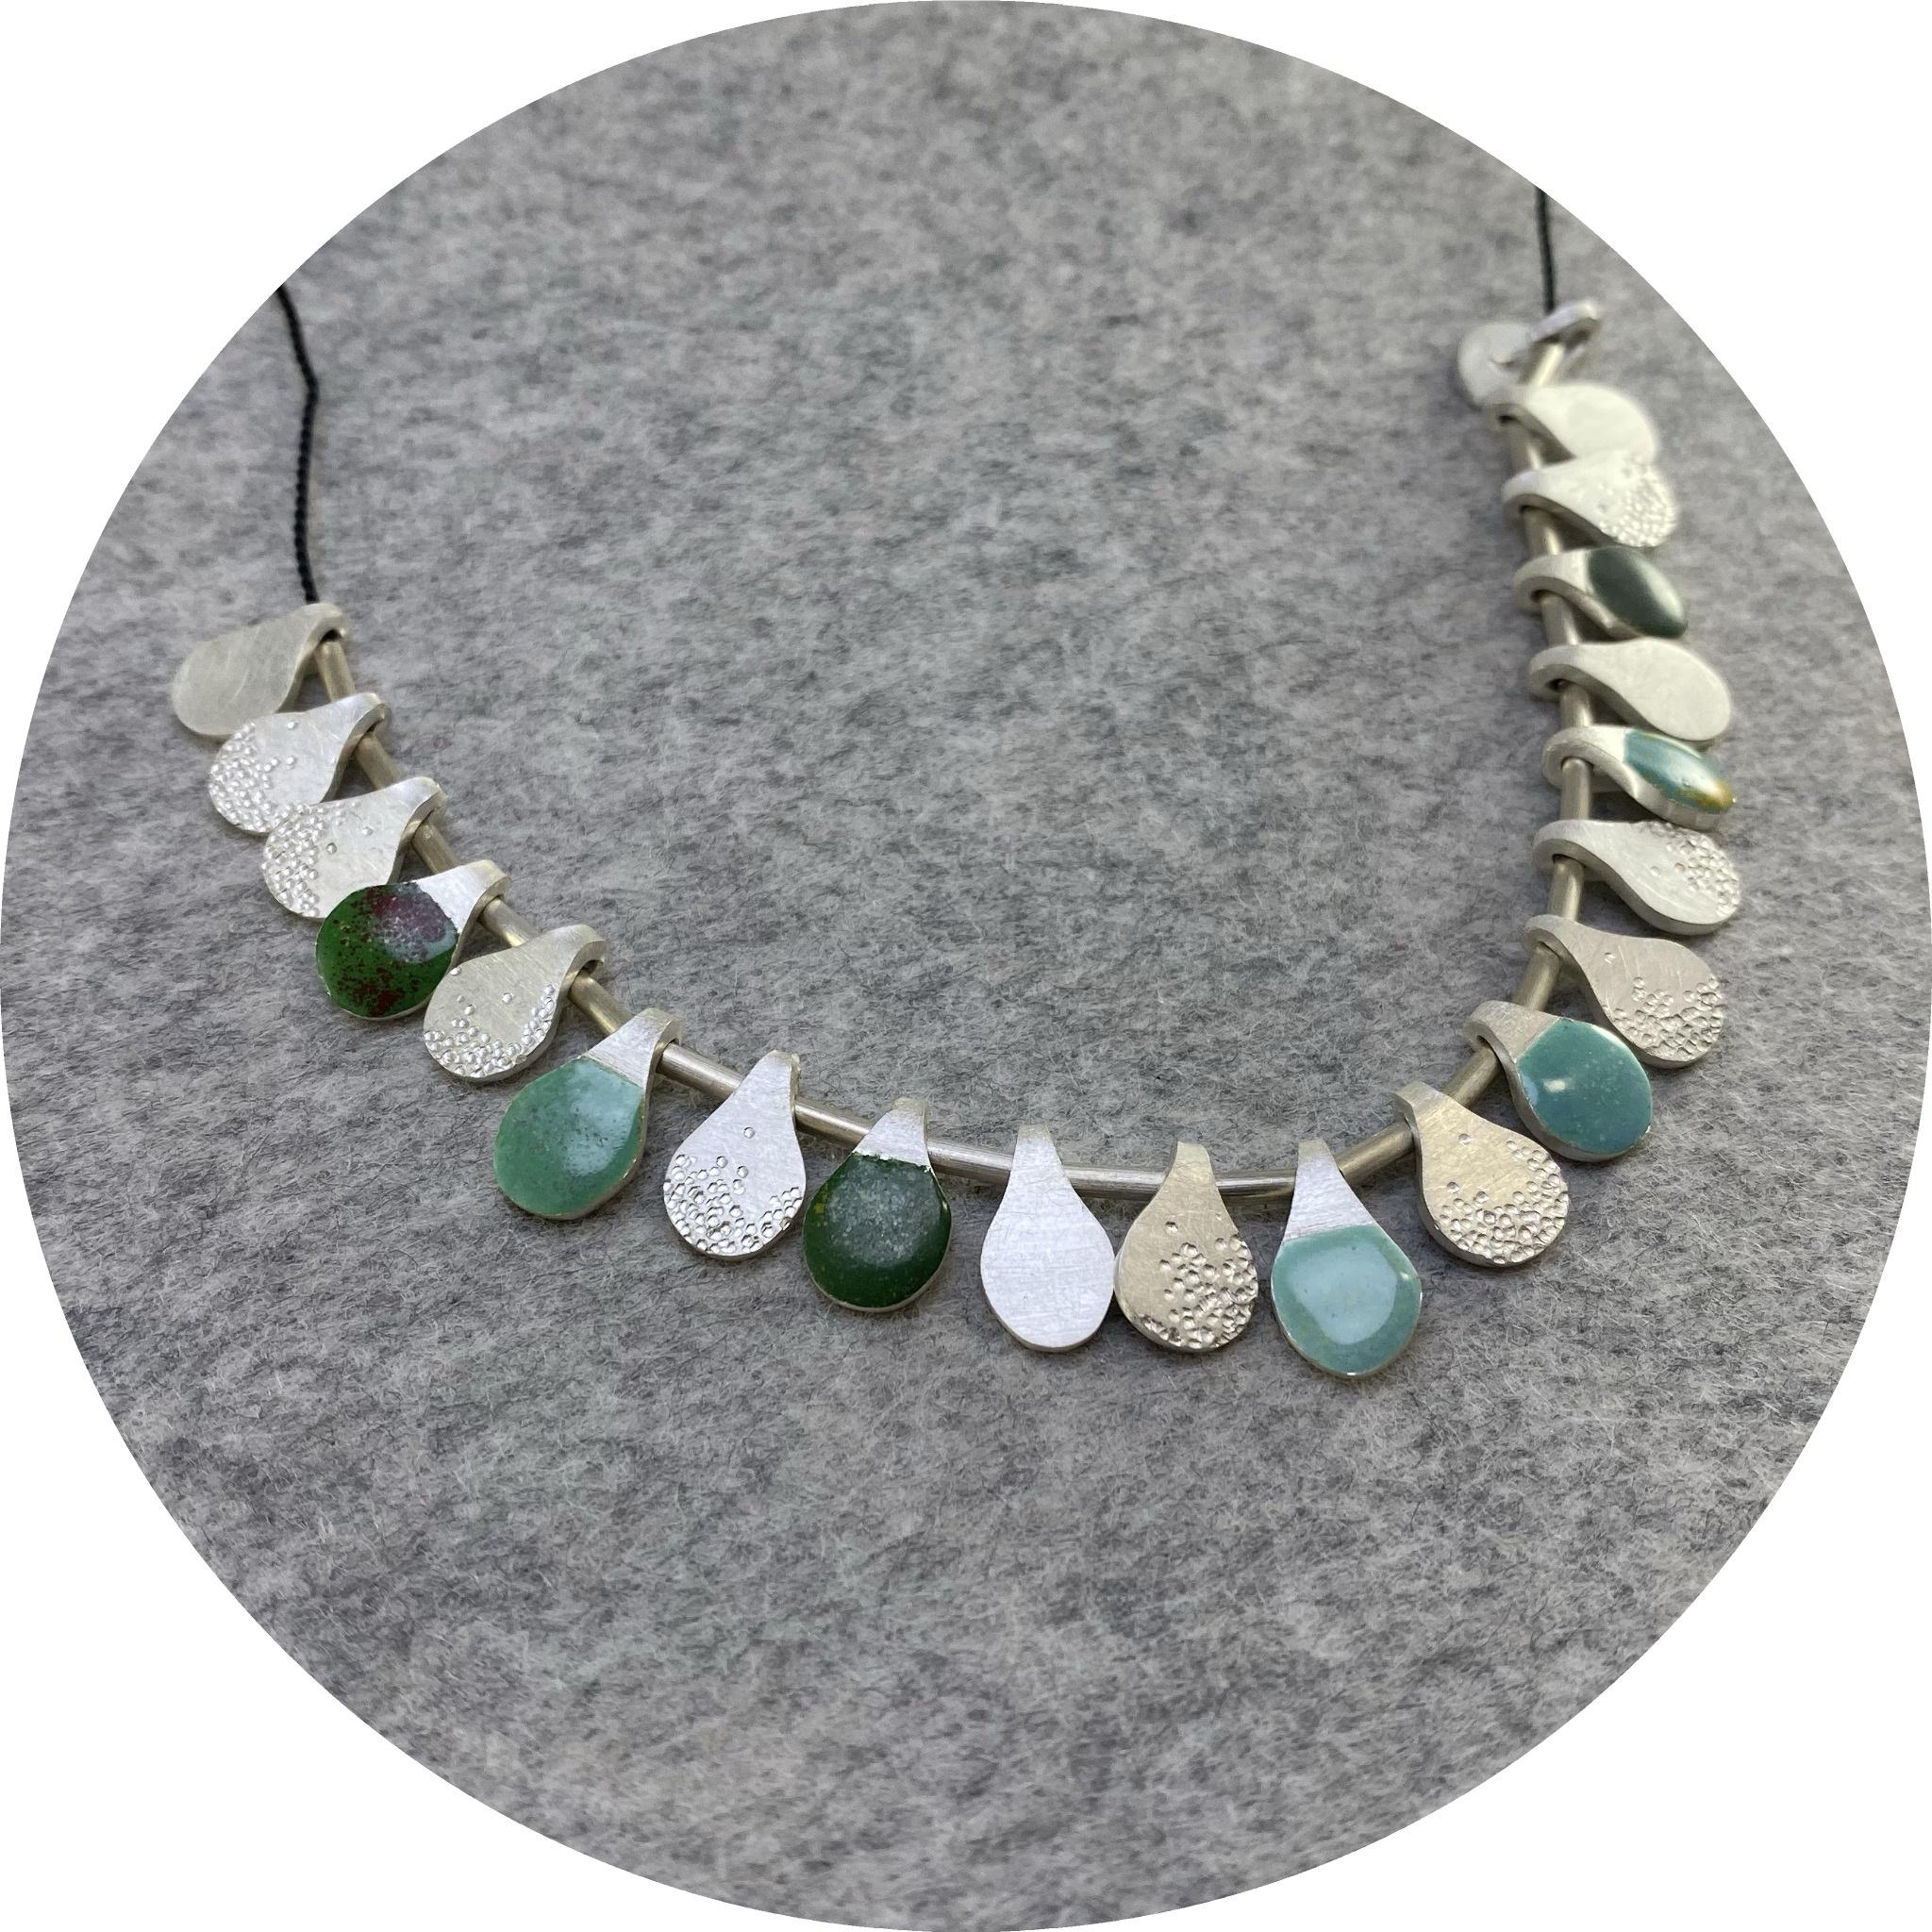 Danielle Lo - Tassle Necklace in Green Tones